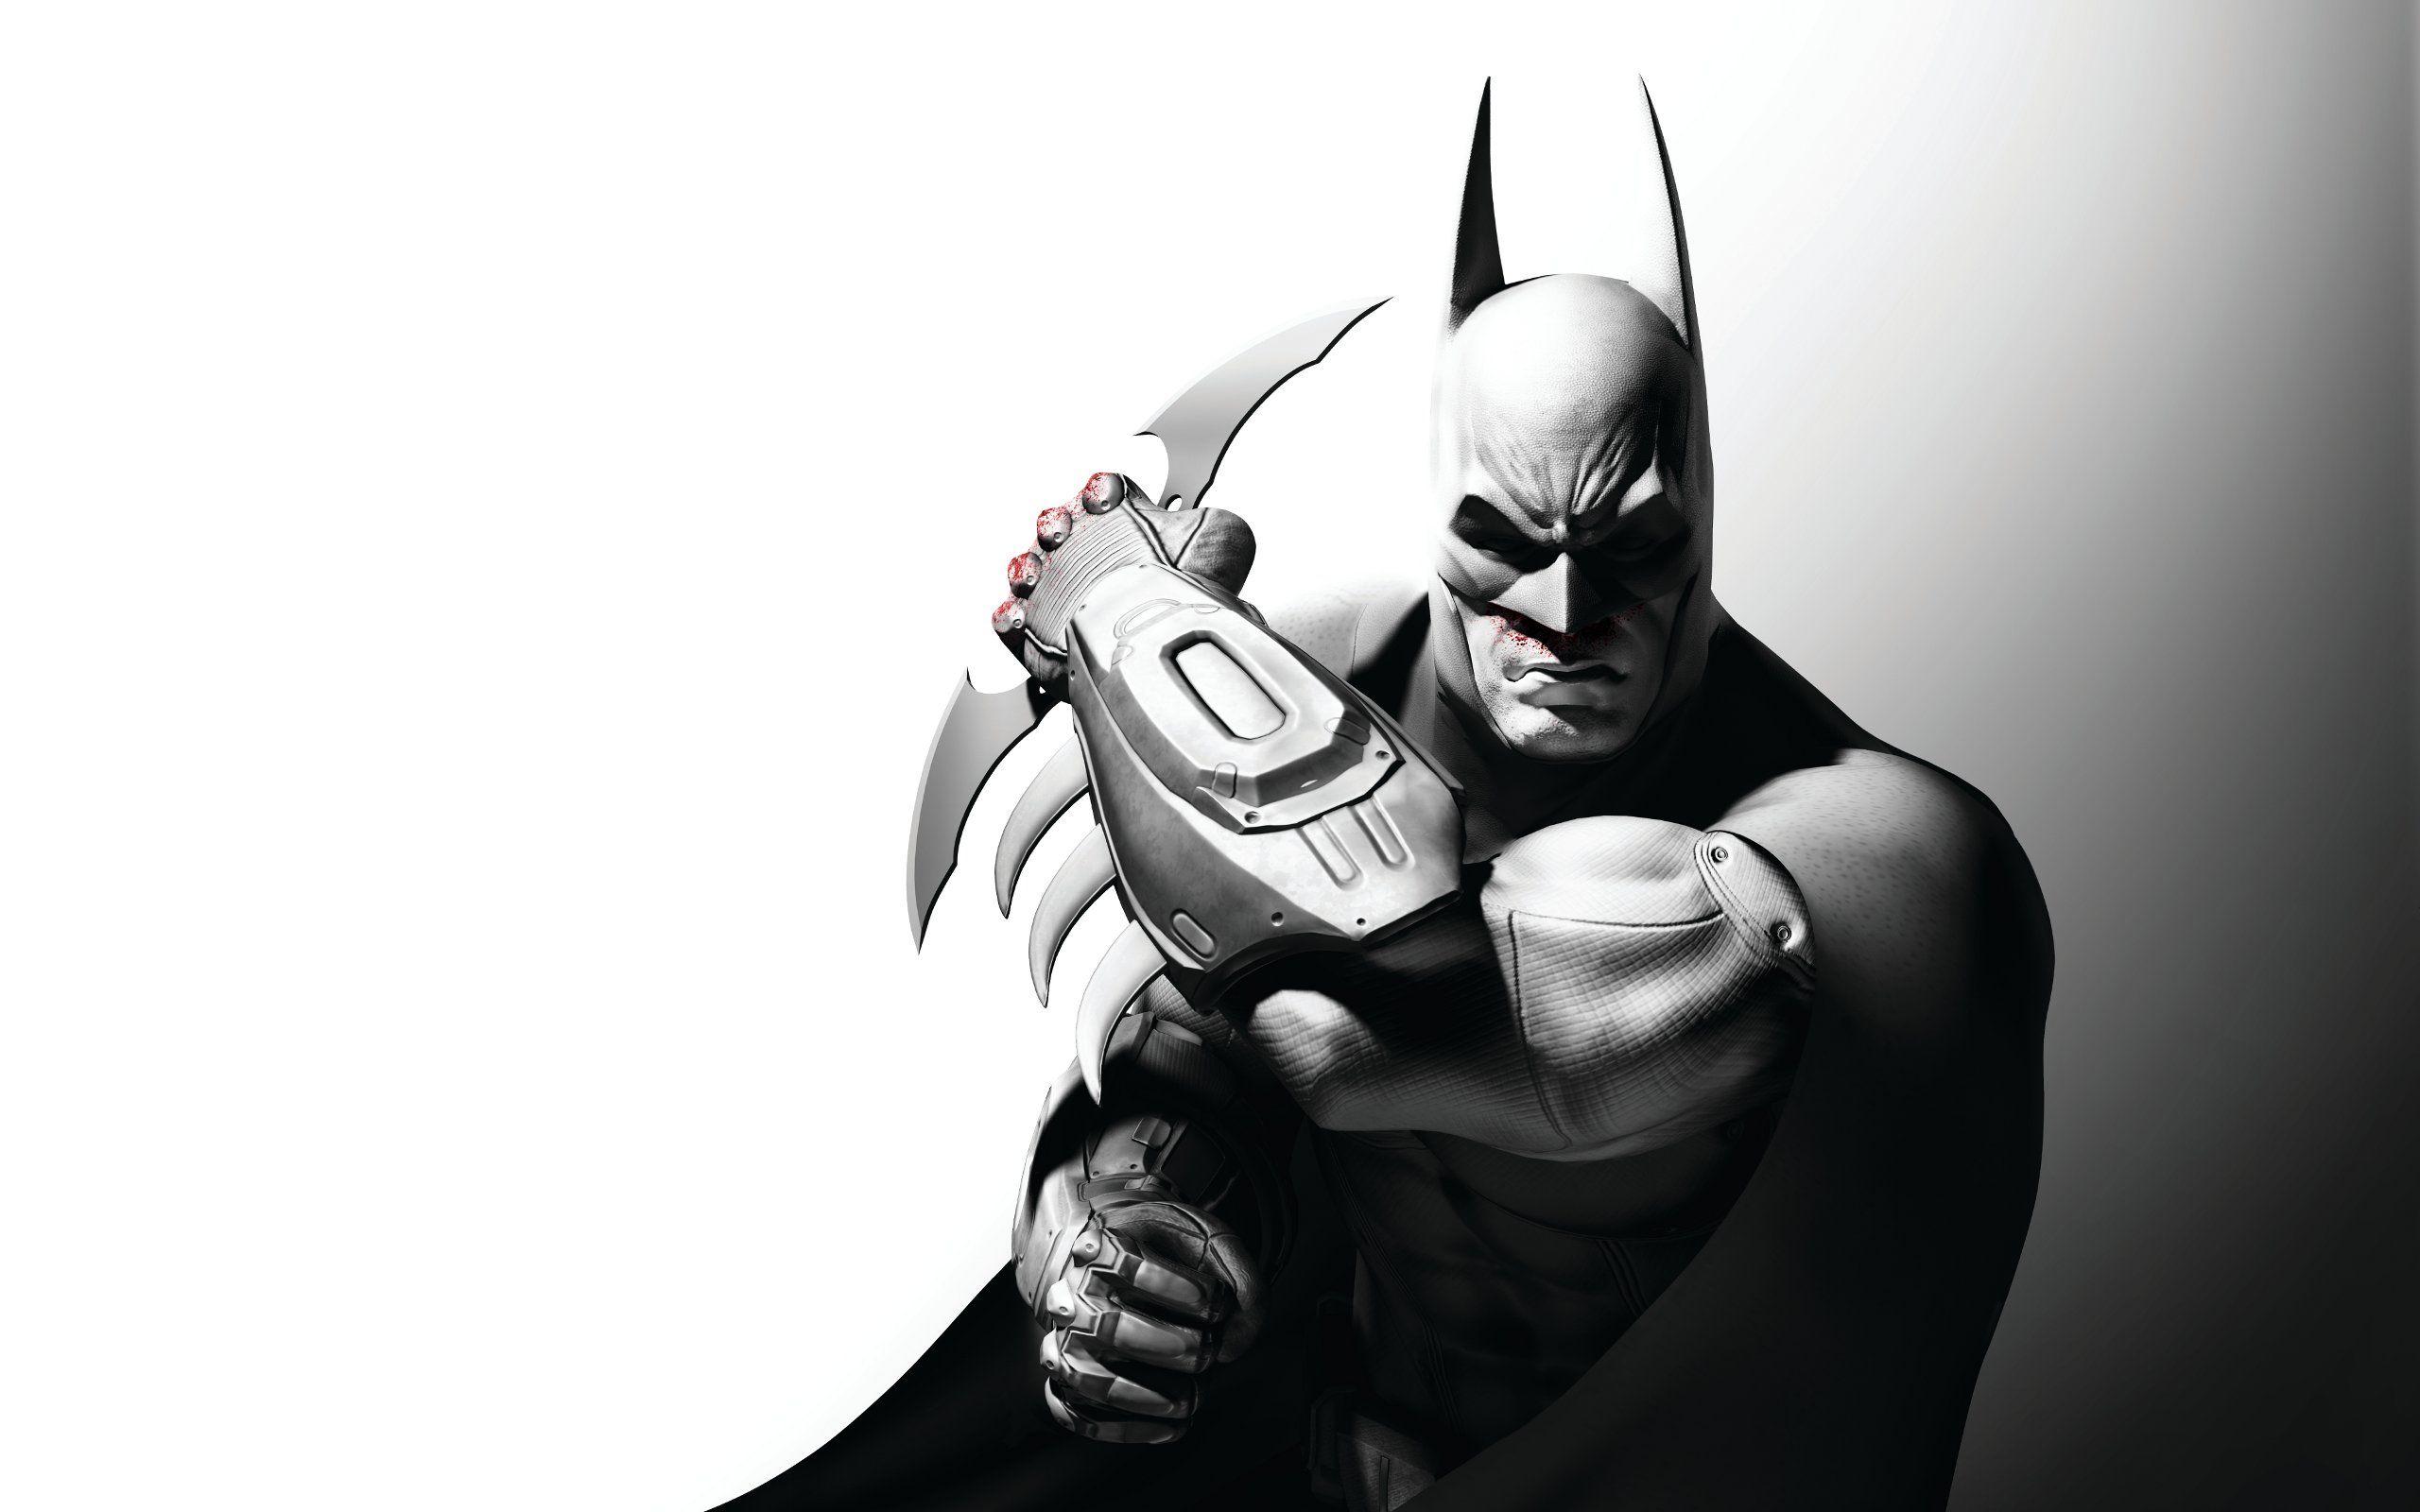 Batman Arkam Jpg 2560 1600 Batman Batman Arkham Knight Game Batman Arkham City